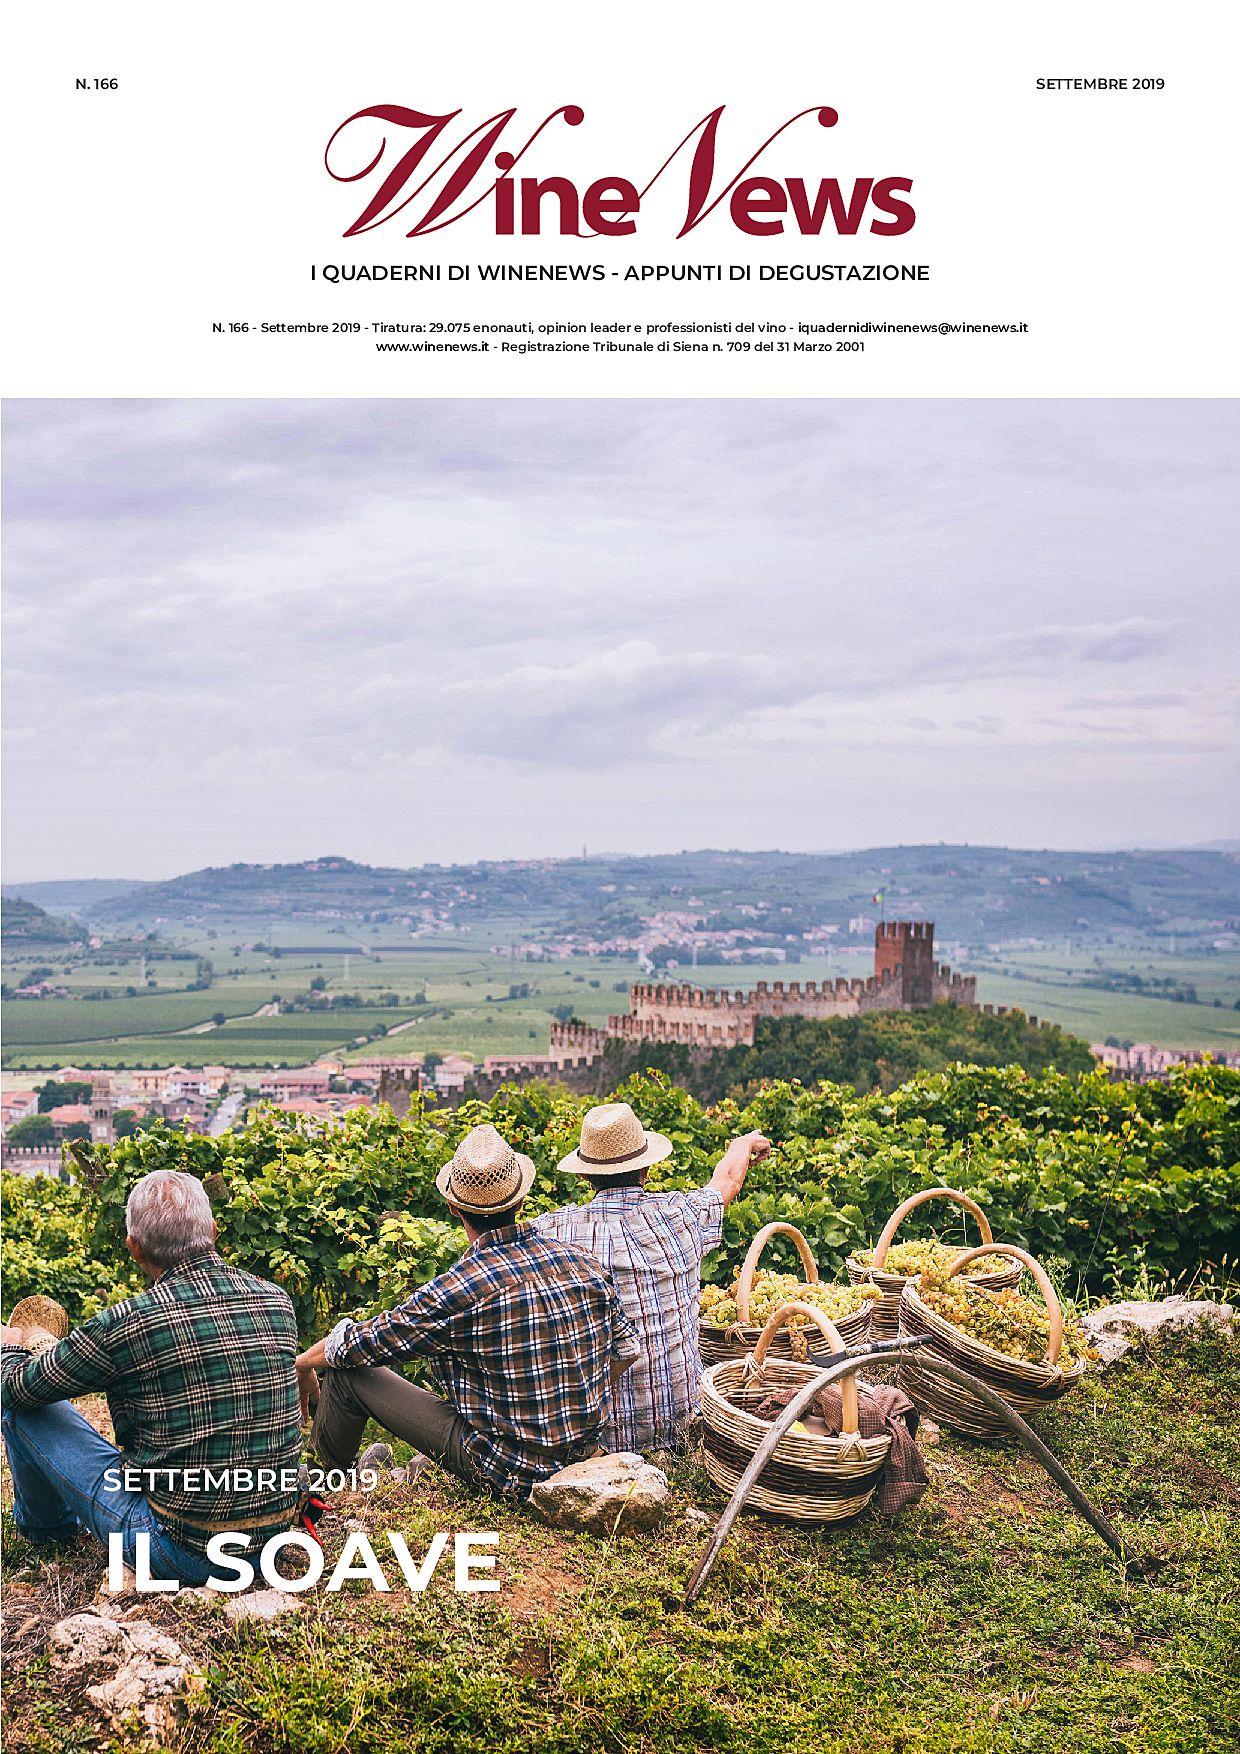 https://winenews.it/php/redirect_pdf.php?id=398604&t=1567778035